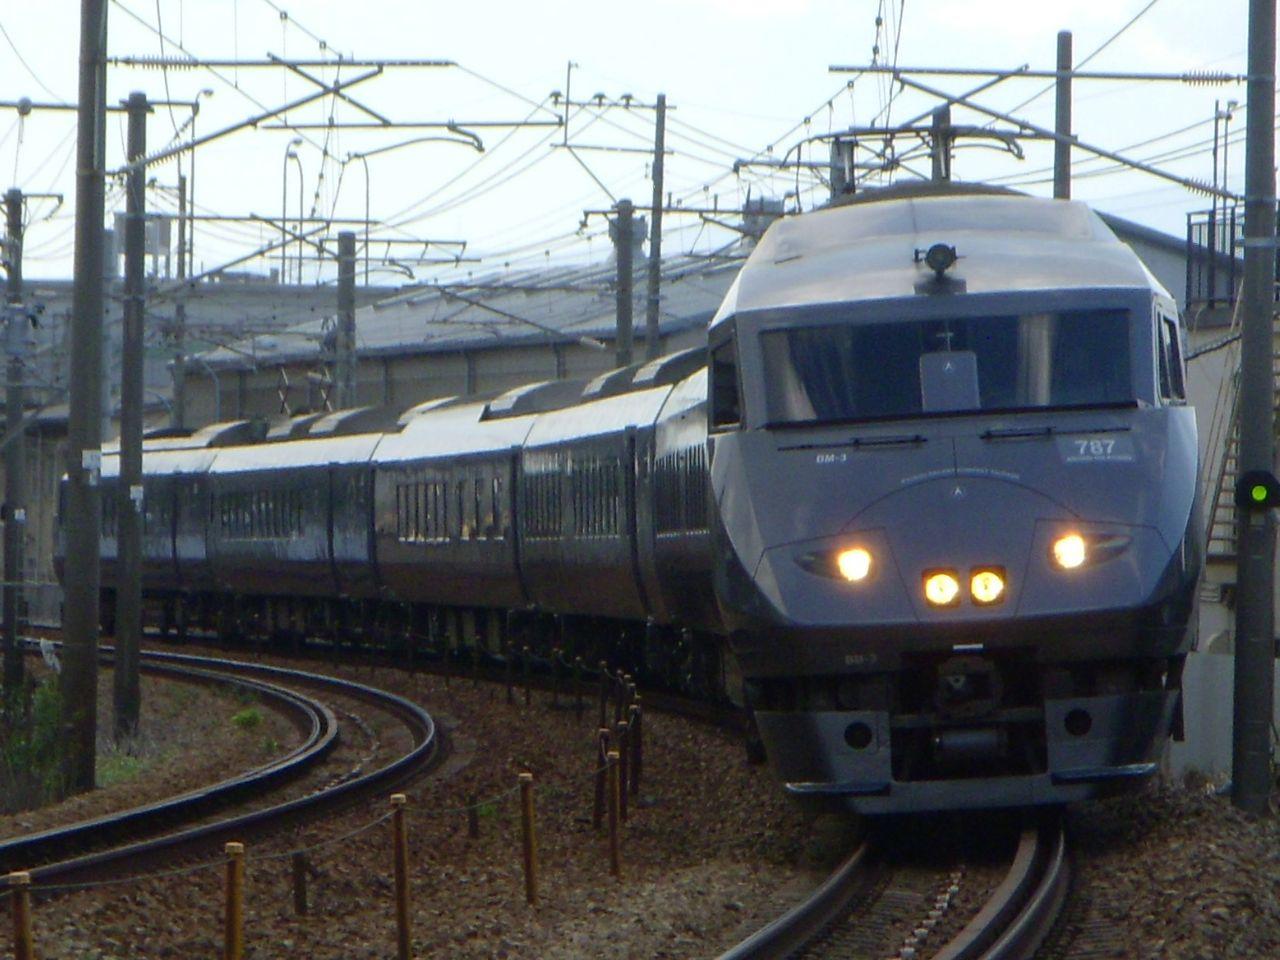 JR九州 787系交流形特急電車 : のりもの研究室